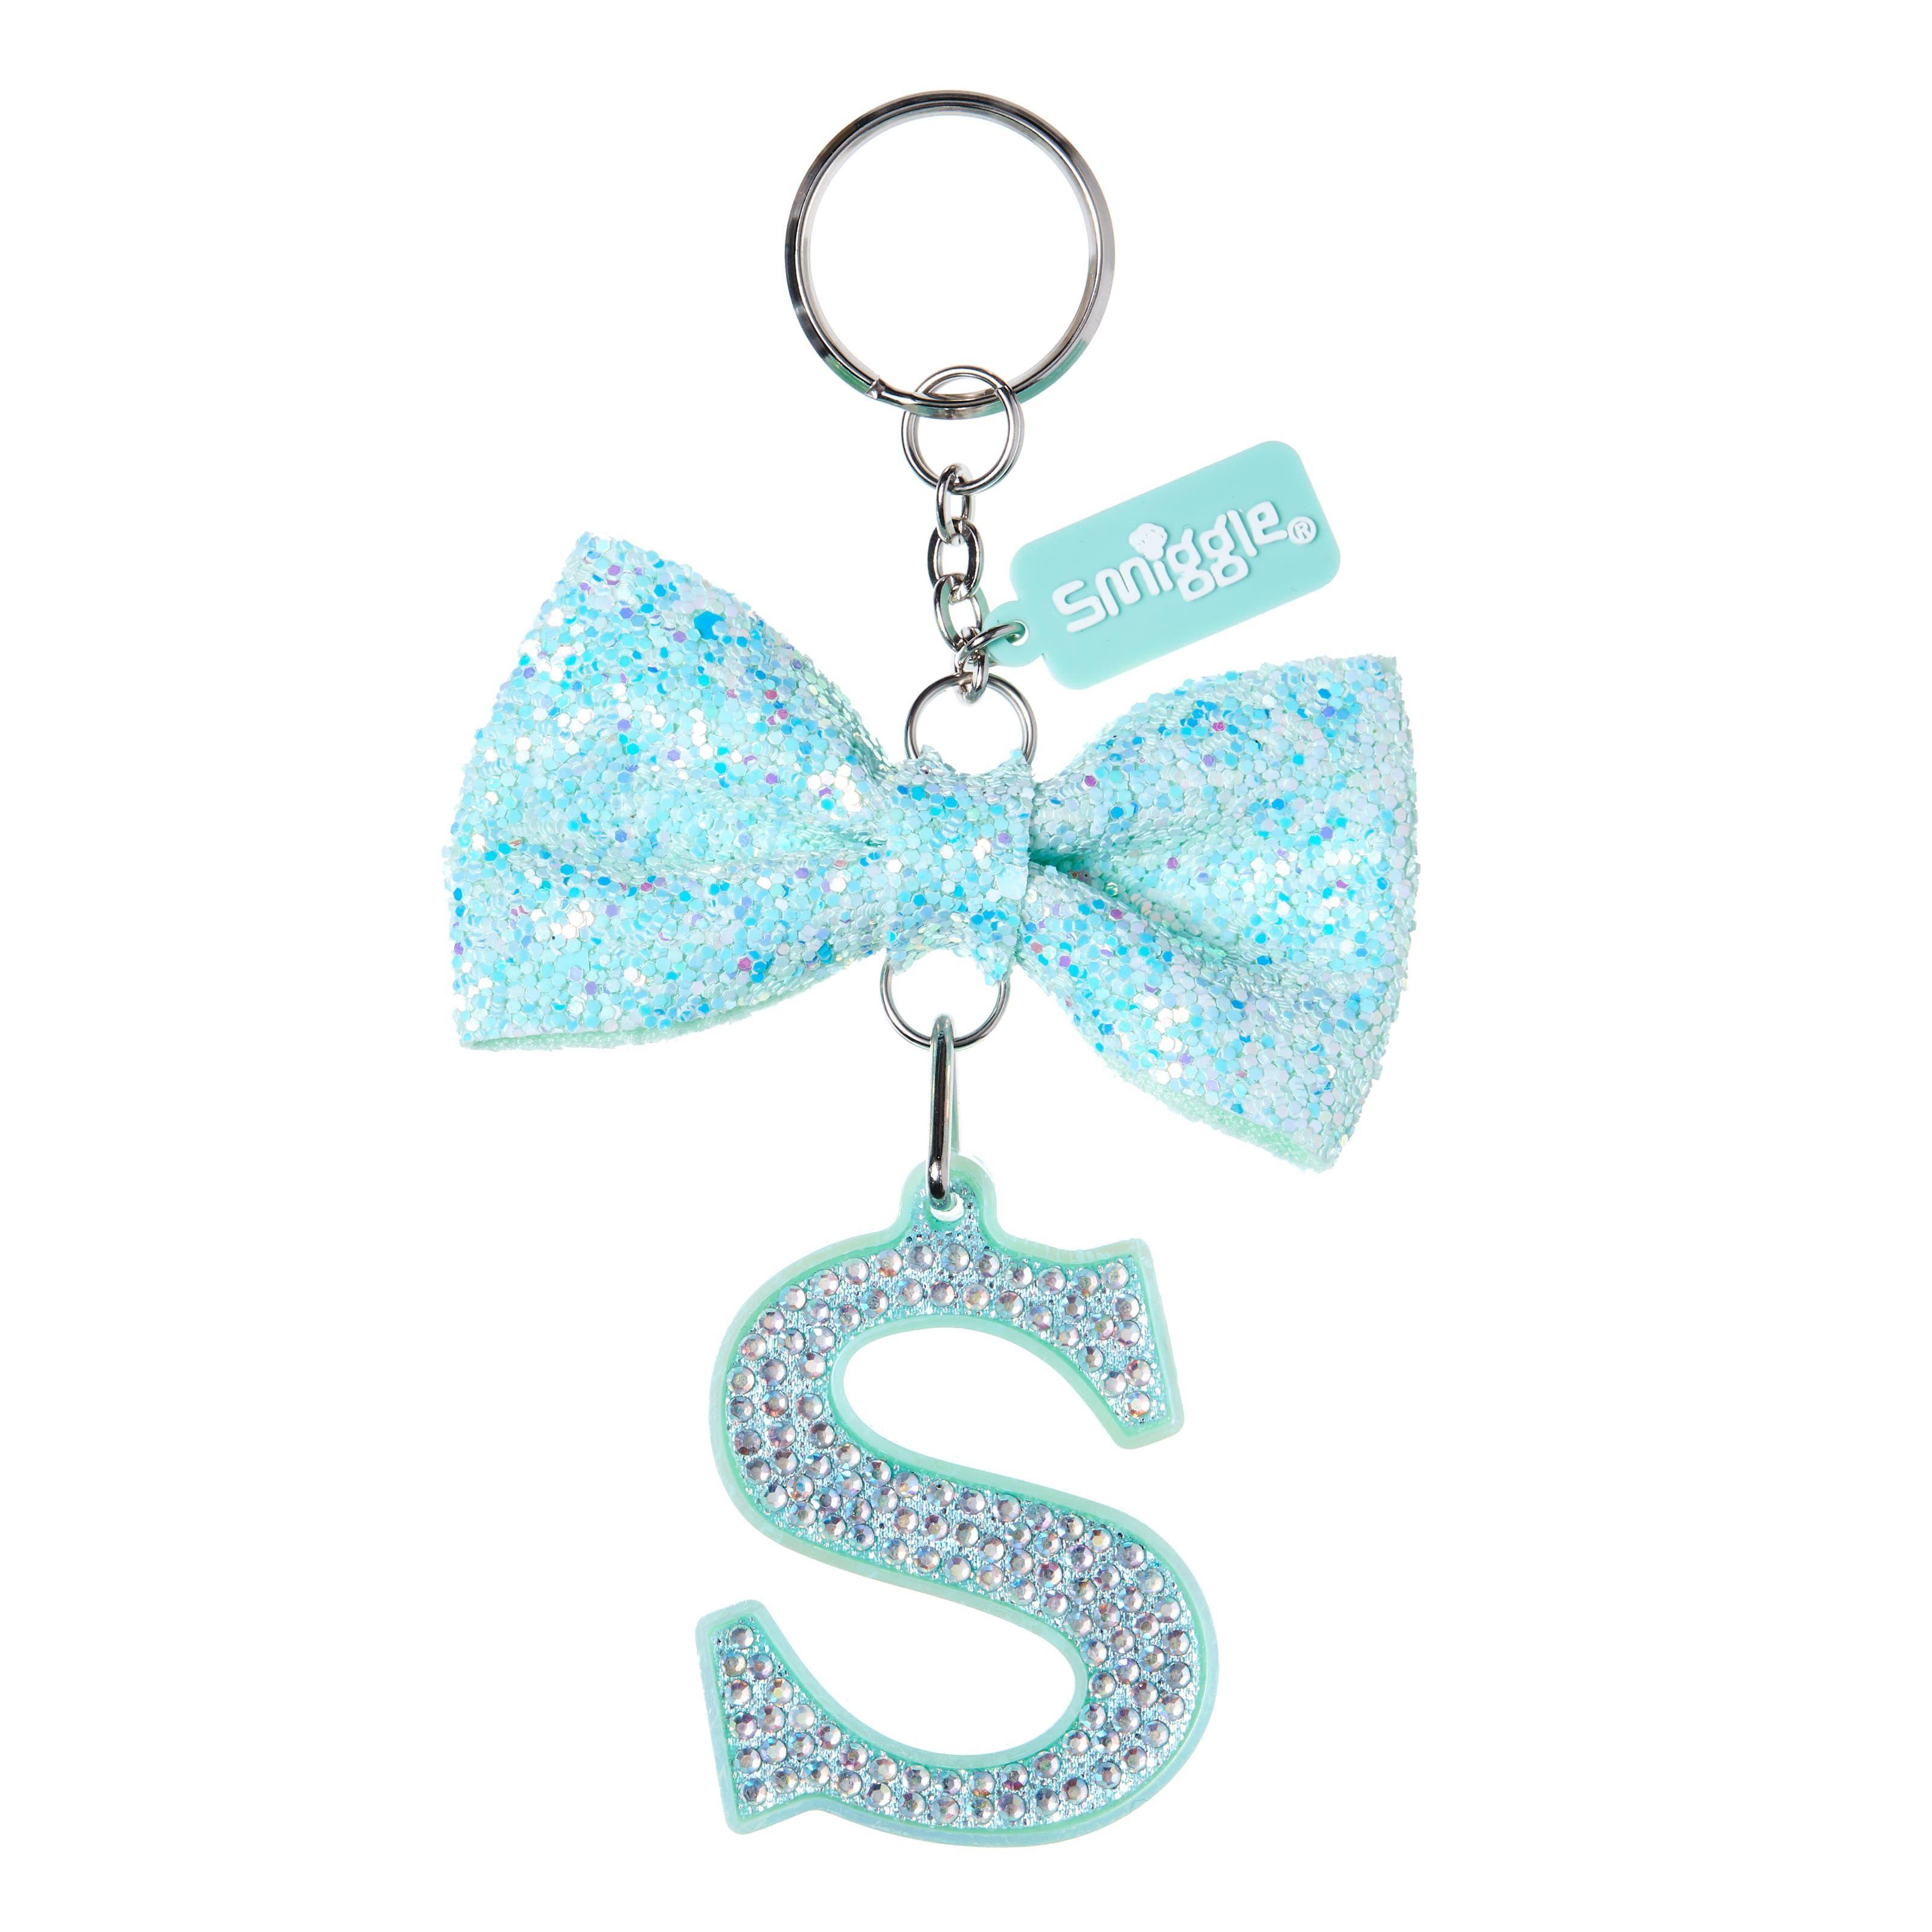 Handmade Sparkling Glitter Bow keyring bag charm silver//black